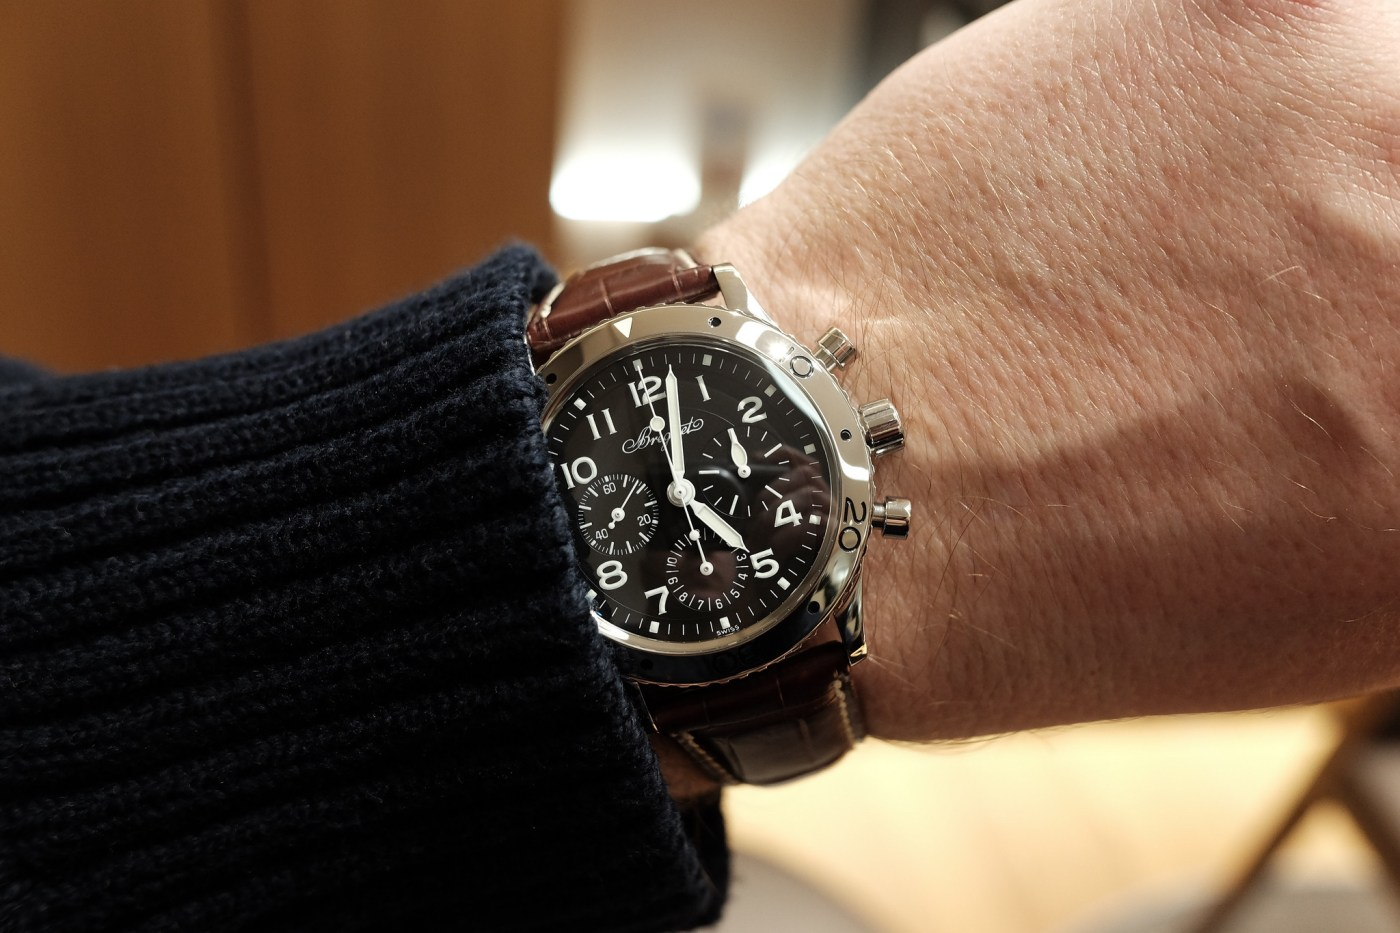 Breguet Type XX Ref.3800ST on the wrist